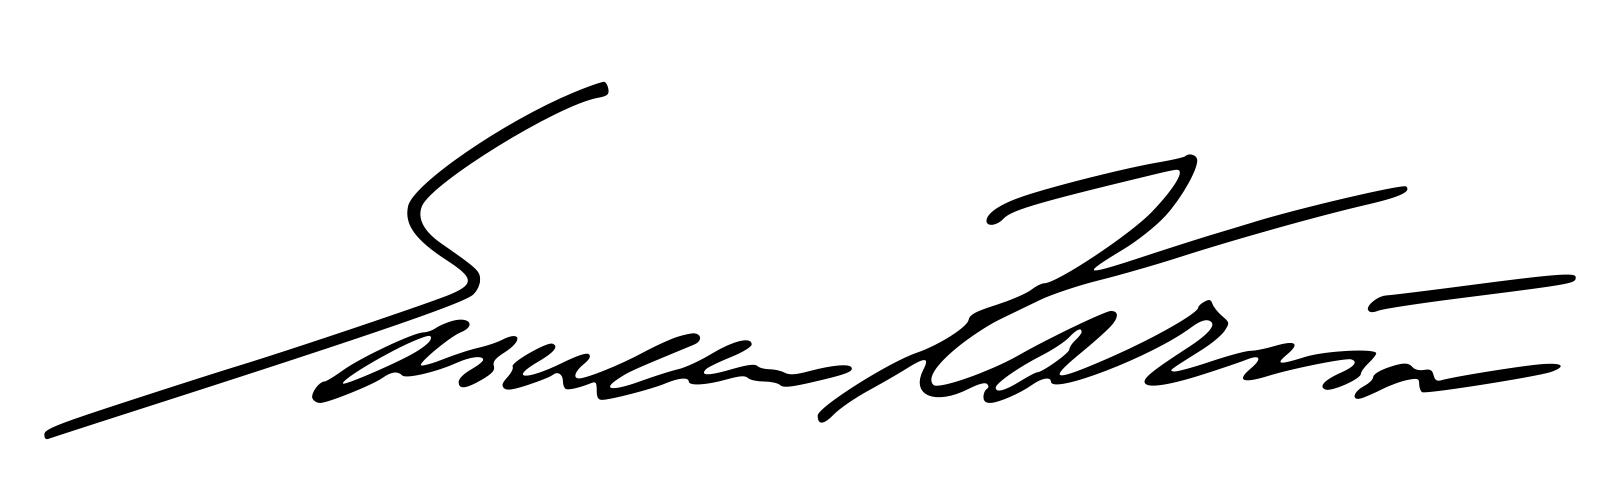 Sameen Karim signature